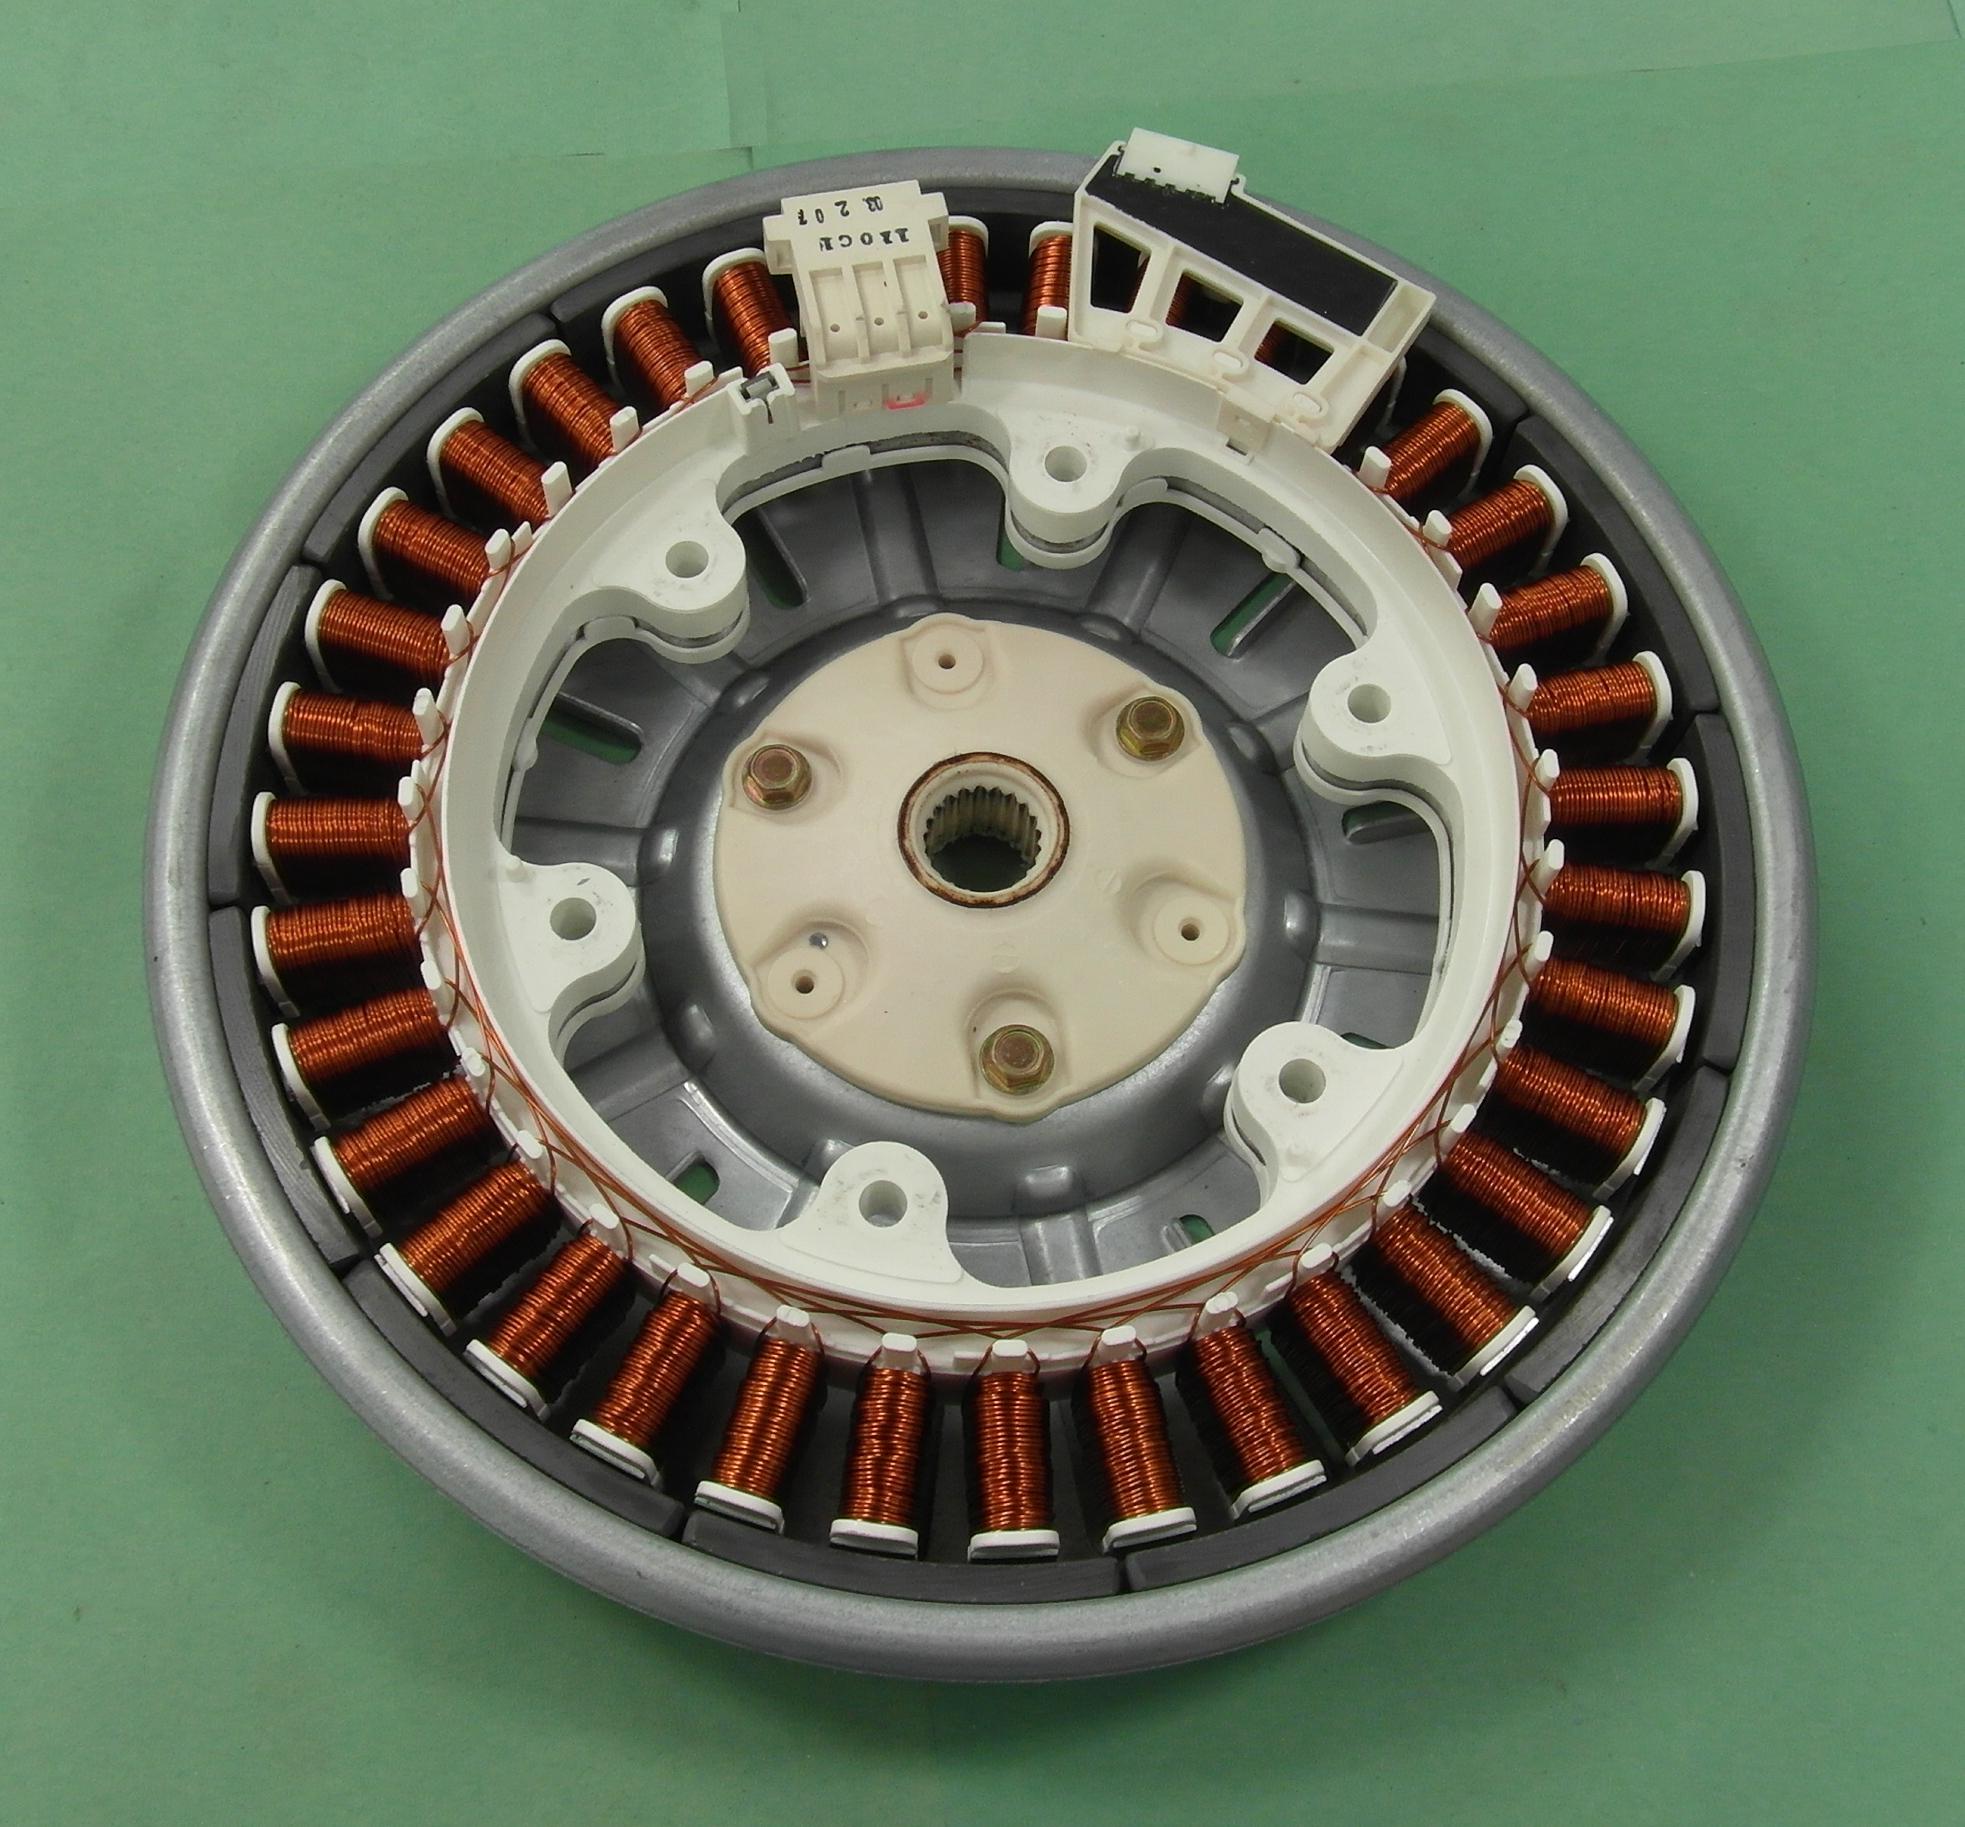 Lg wm 1480fhd washing machine direct drive rotor stator for Direct drive motor washing machine